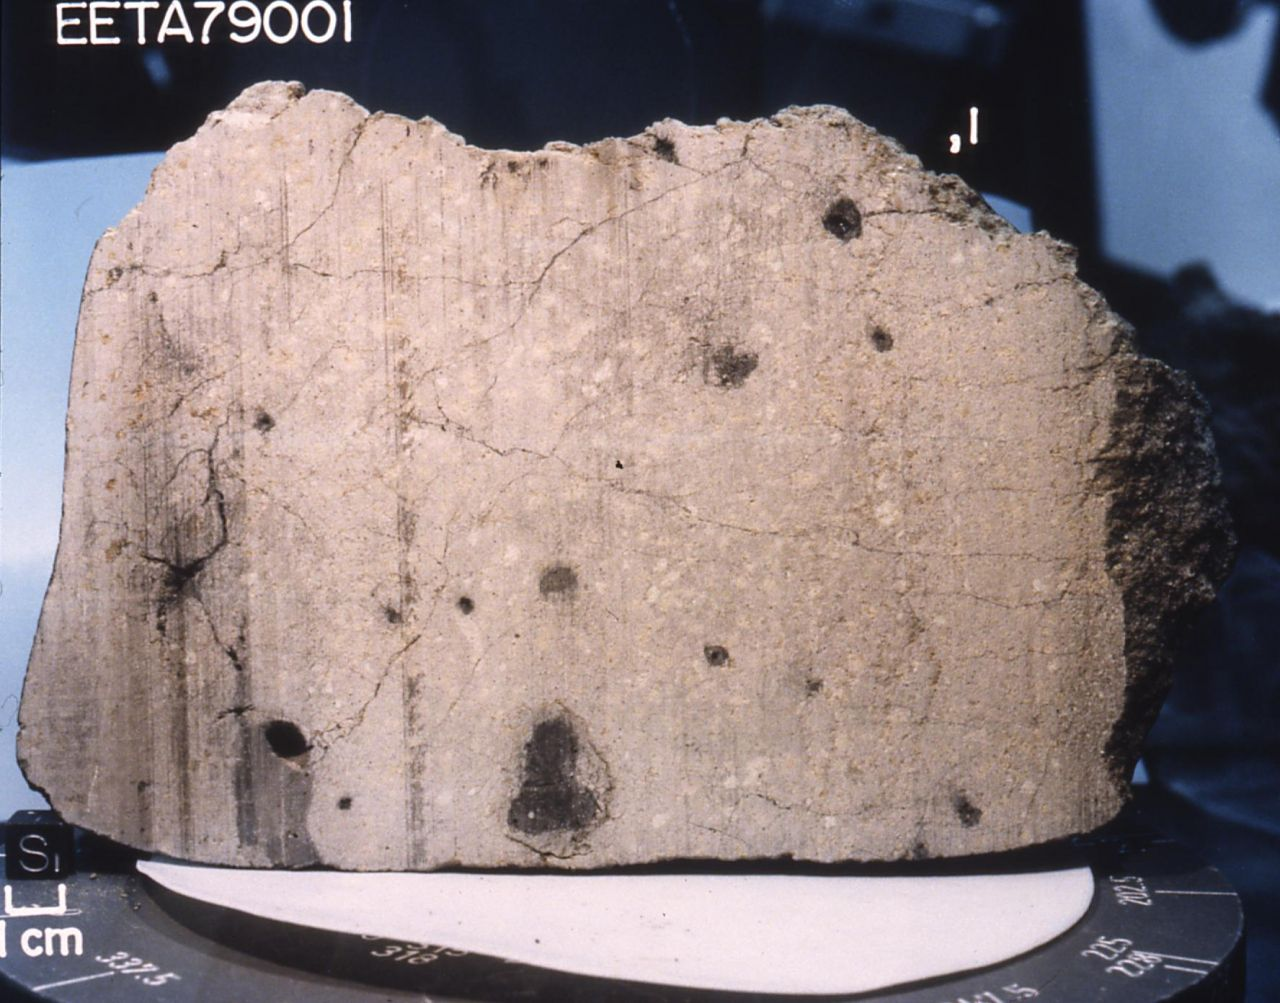 Der erste bekannte Mars-Meteorit EETA79001